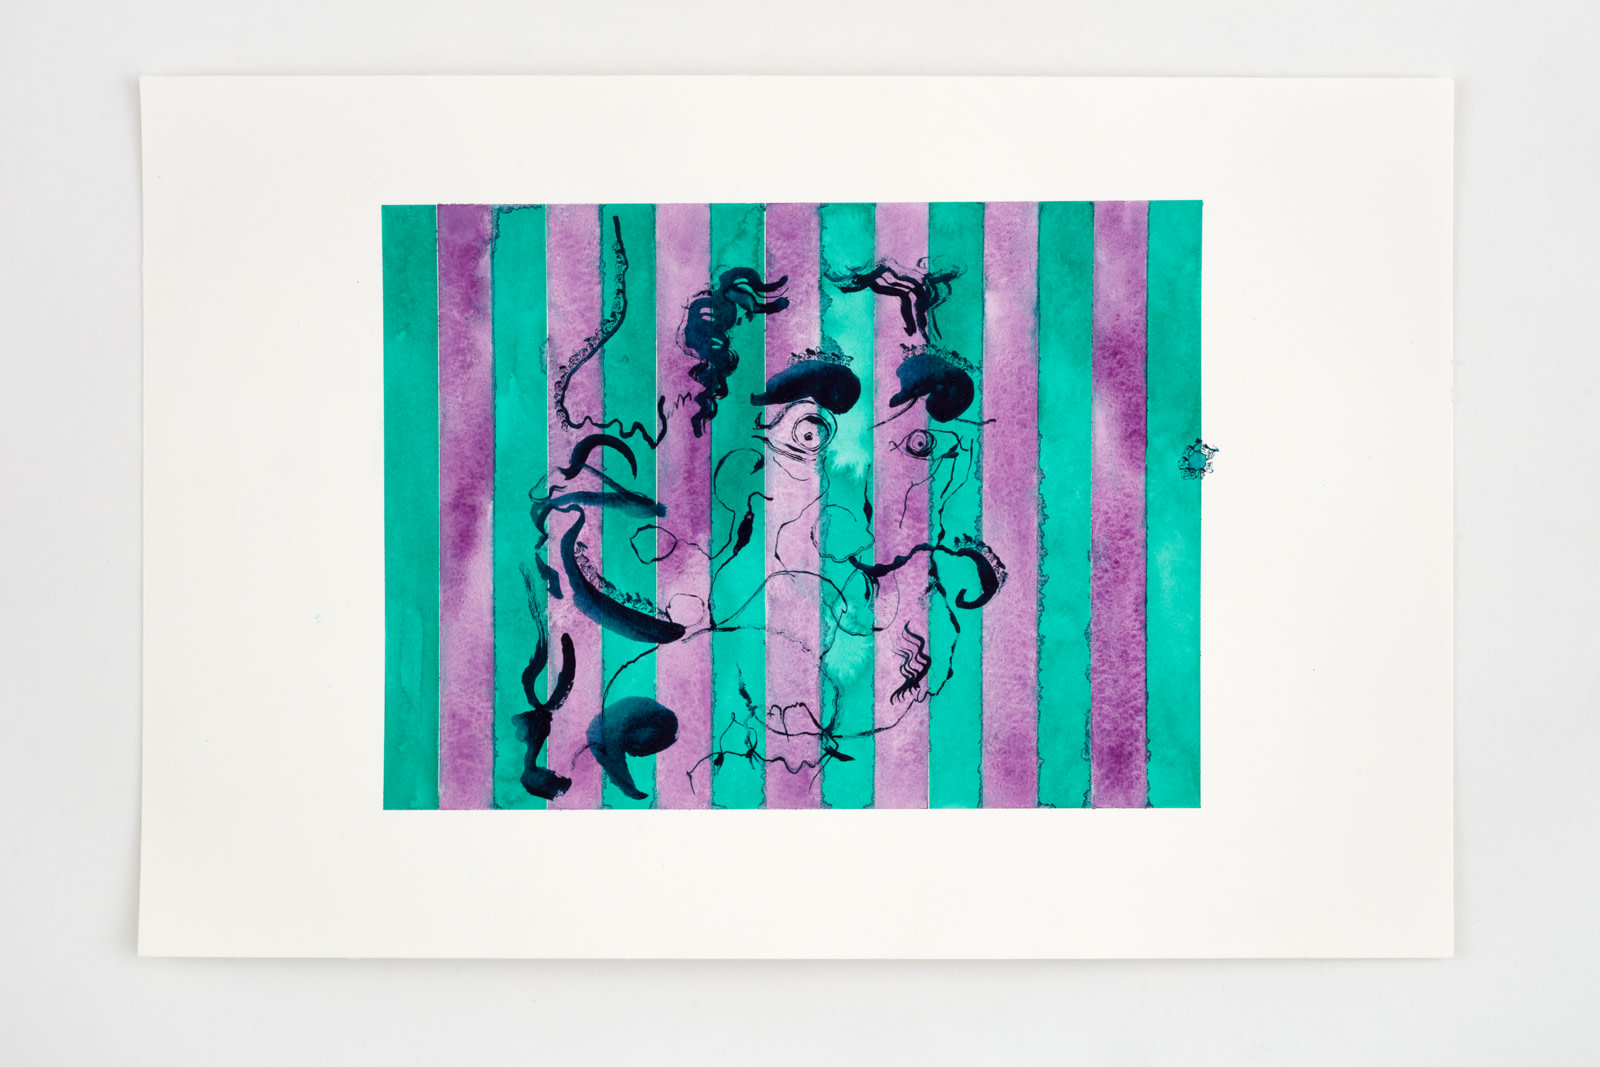 "<div class=""artwork_caption""><div class=""title""><em>Untitled</em>, 2020</div><div class=""medium"">watercolour on paper</div><div class=""dimensions"">site size: 30.4 x 45.4 cm / 12 x 17 ⅞ in<br />frame size: 34.1 x 46.4 x 2.5 cm / 13 ⅜ x 18 ¼ x 1 in</div></div><div class=""link""><span class=""website_contact_form"" data-contact-form-details=""Untitled , 2020  watercolour on paper  site size: 30.4 x 45.4 cm / 12 x 17 ⅞ in frame size: 34.1 x 46.4 x 2.5 cm / 13 ⅜ x 18 ¼ x 1 in"" data-contact-form-image=""https://artlogic-res.cloudinary.com/w_200,h_200,c_fill,f_auto,fl_lossy/ws-sadiecoles/usr/exhibitions/images/exhibitions/829/hq24-hm16776d-untitled_unframed.jpeg"">Enquire</span></div>"